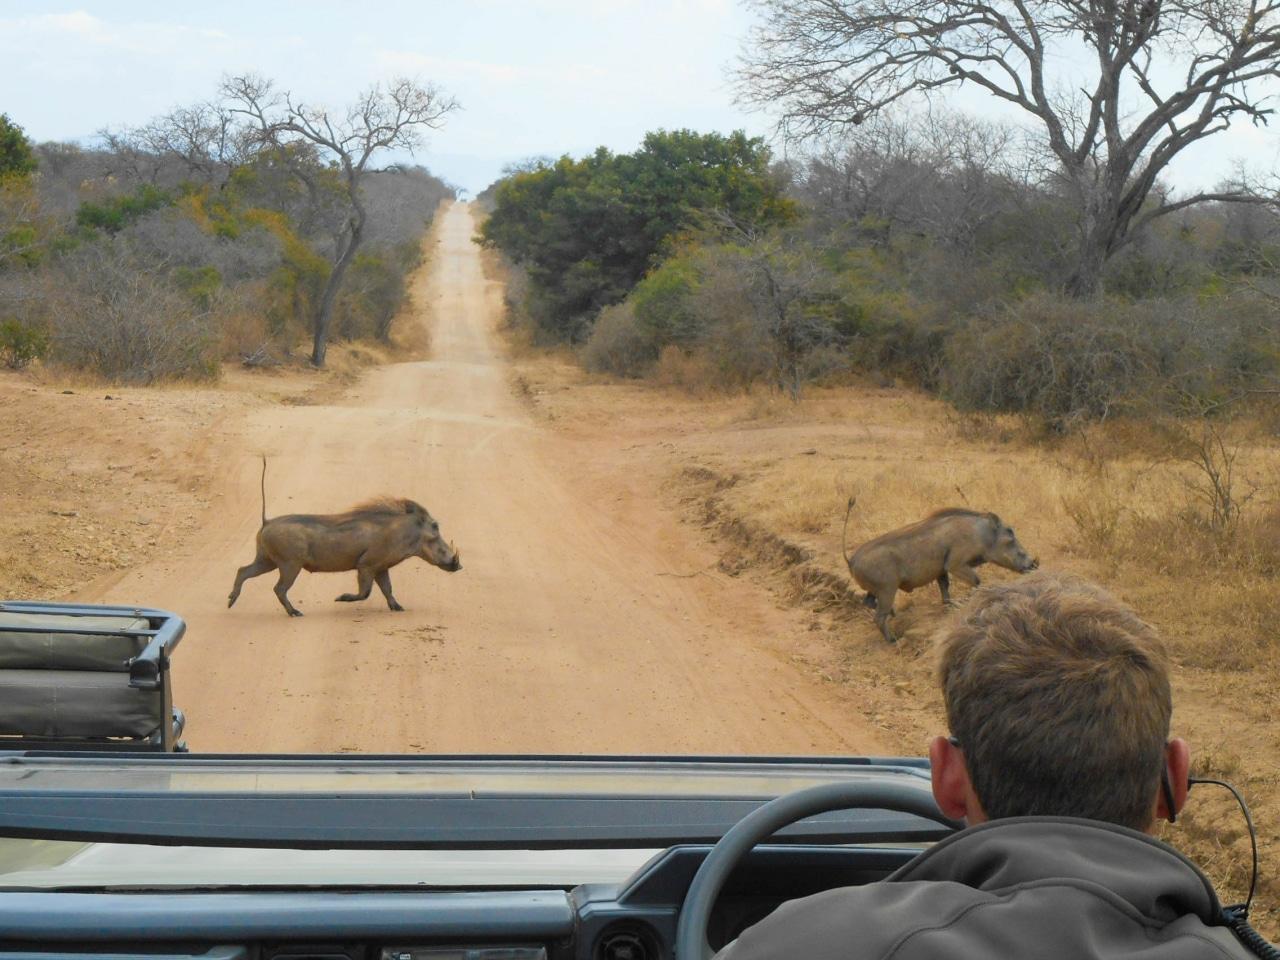 safari arrivee (4 sur 5)